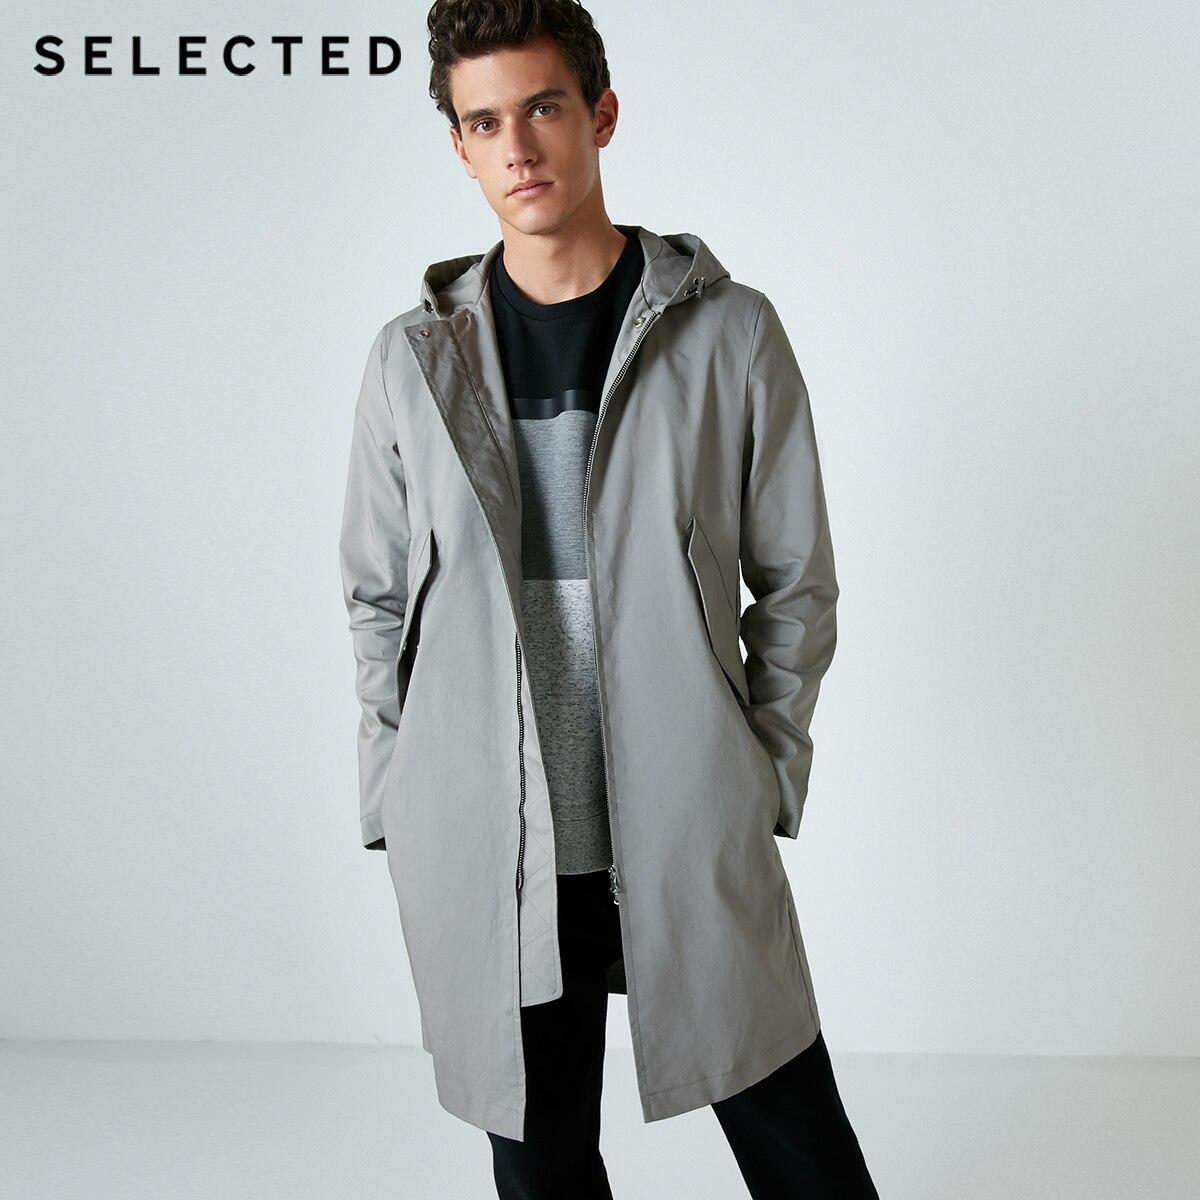 SELECTED Slade new style straight hat hooded men's mid length windbreaker S|4183OM516